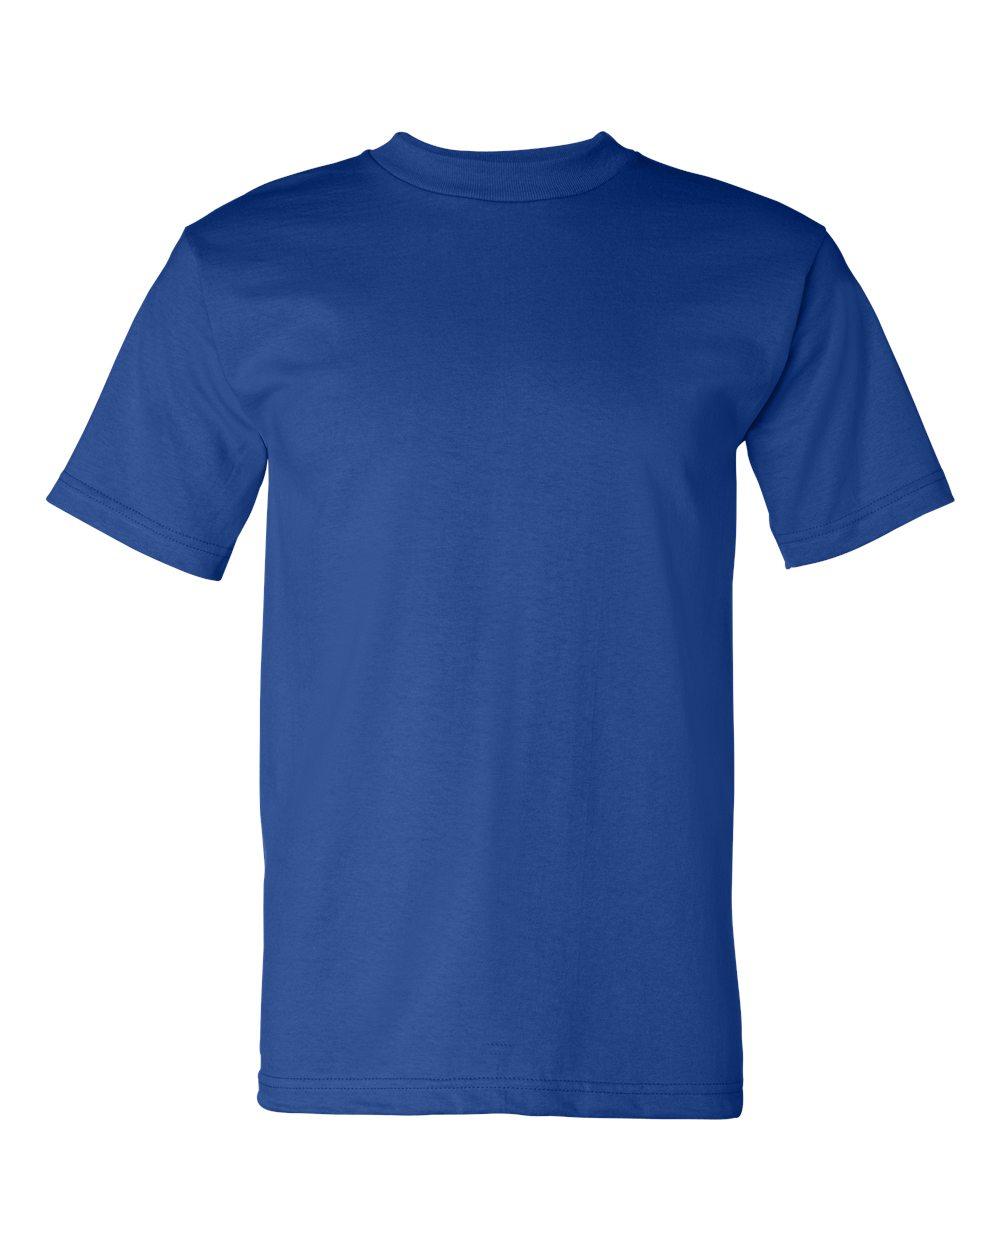 Bayside-Mens-Cotton-Blank-USA-Made-Short-Sleeve-T-Shirt-5100-up-to-5XL thumbnail 36